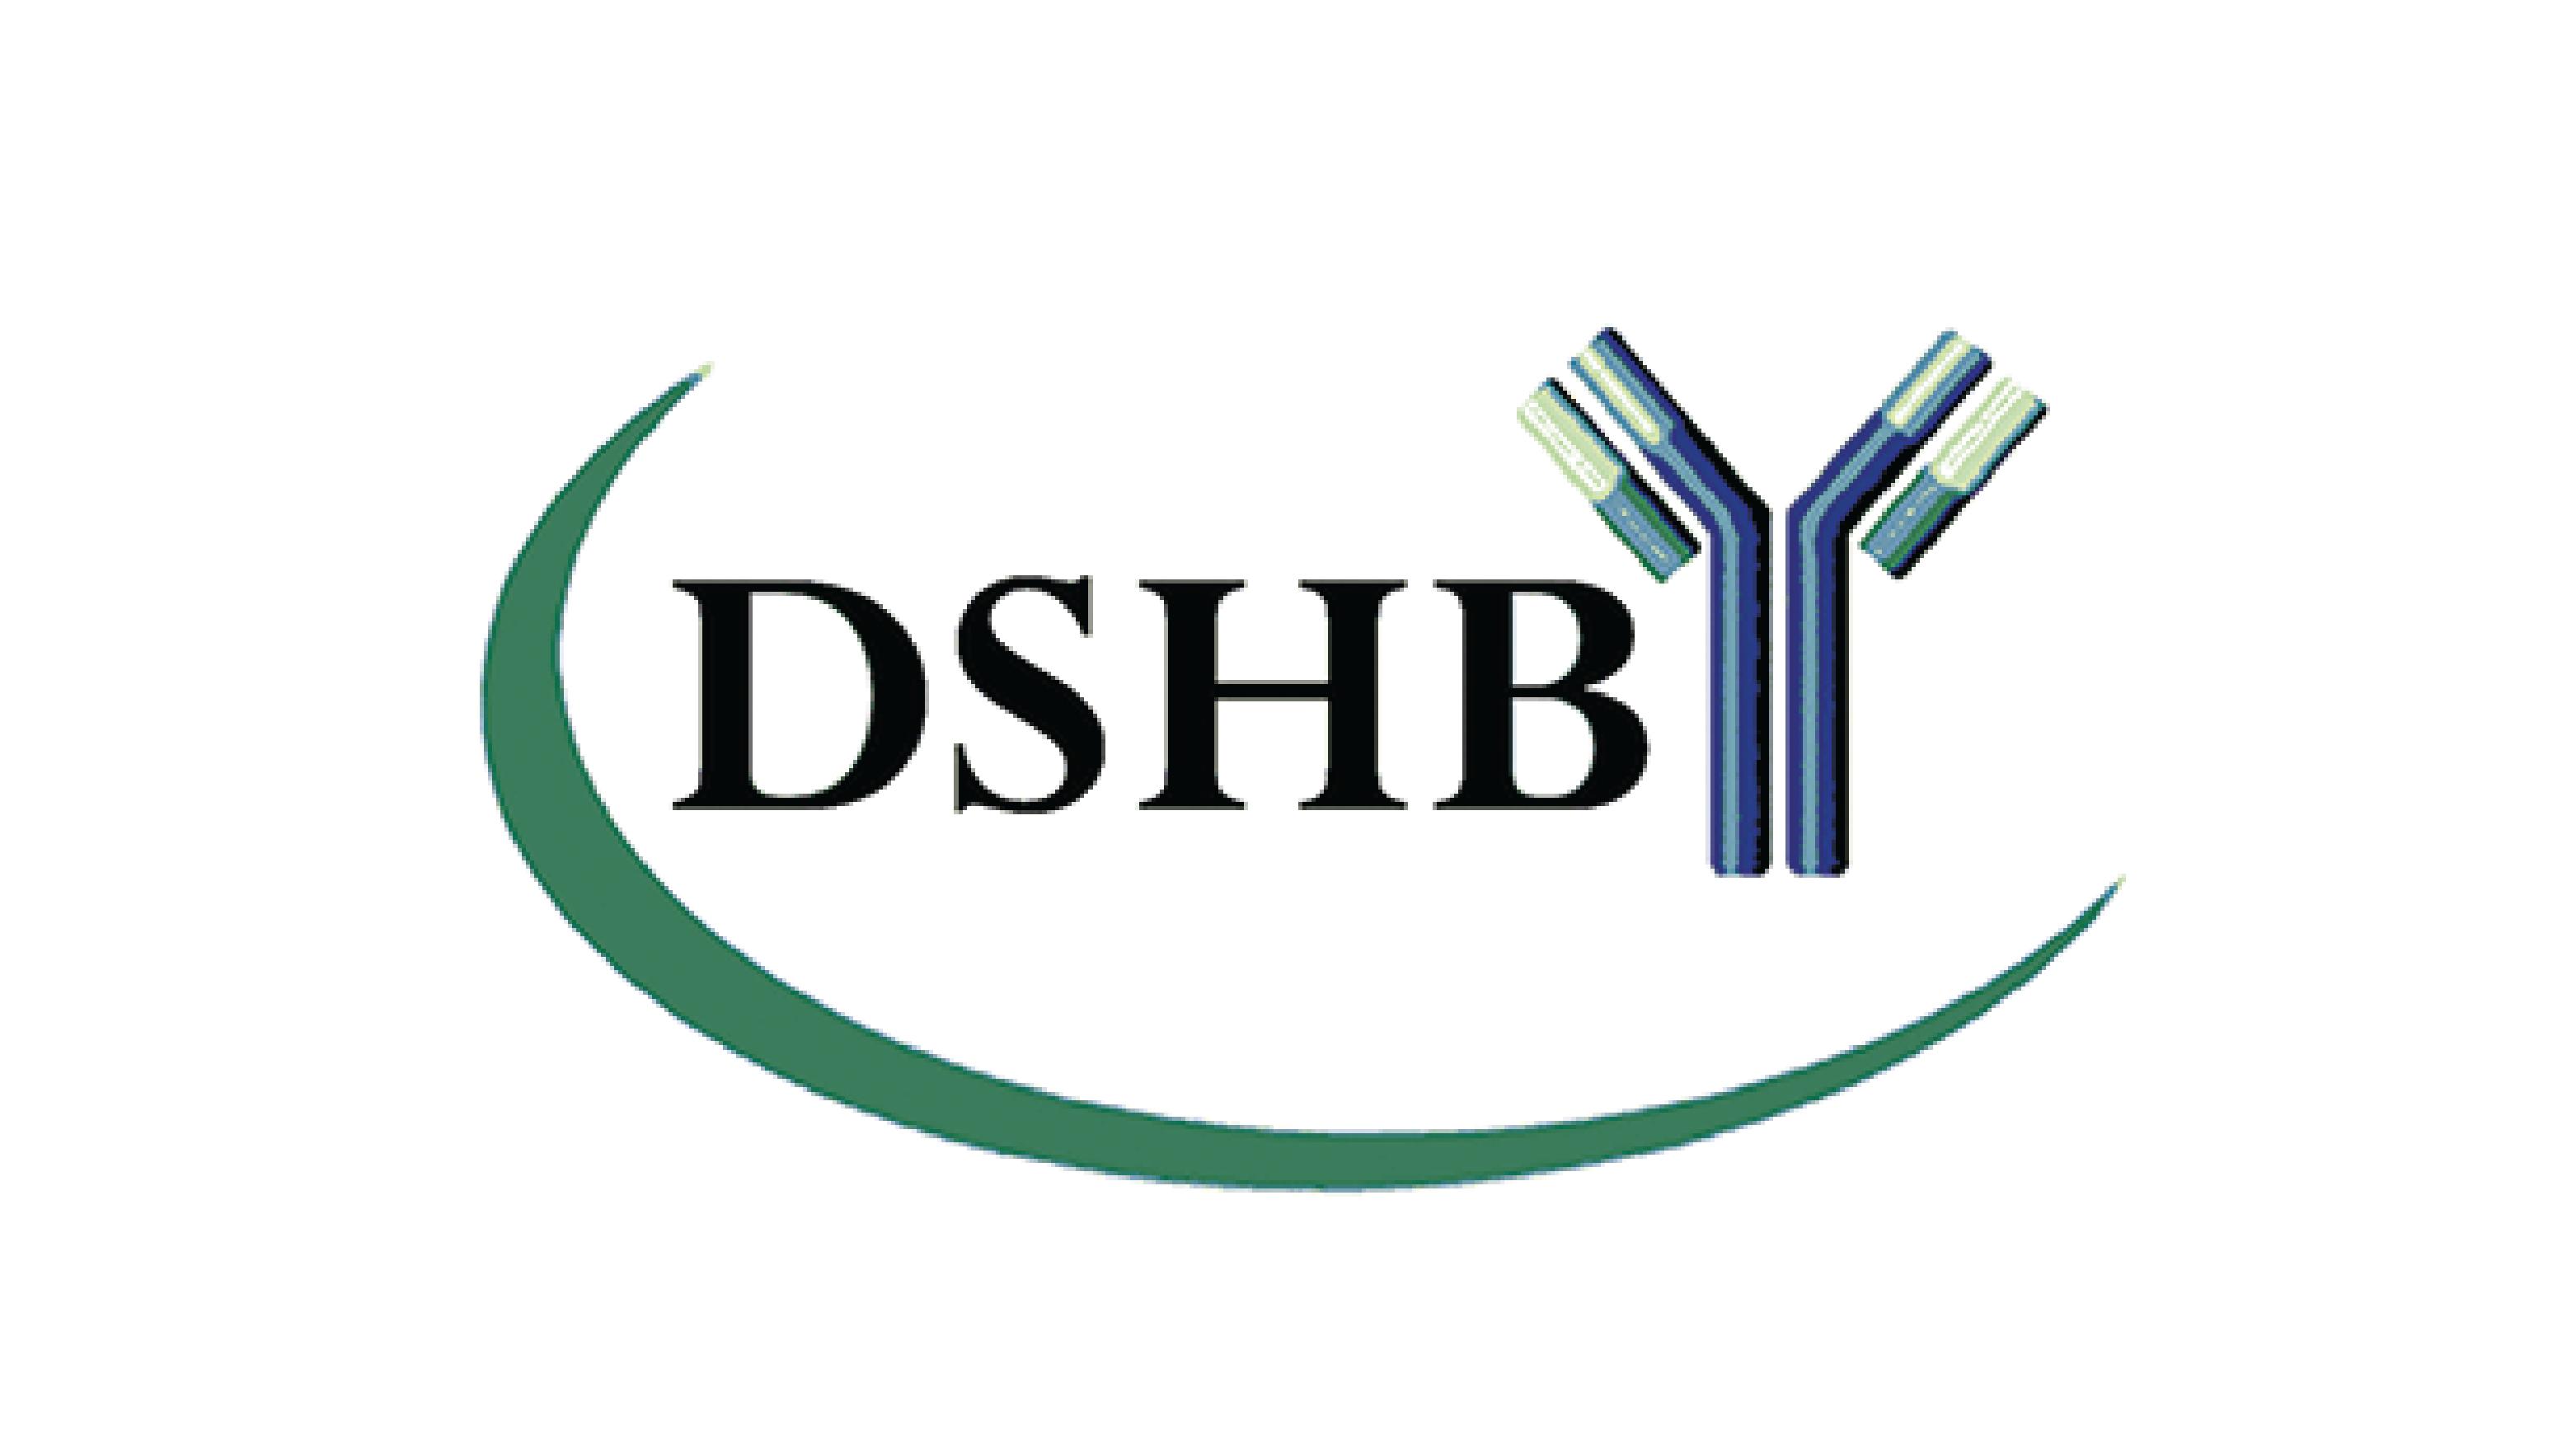 DSHB is a TPDA sponsor of Neuroscience 2021.